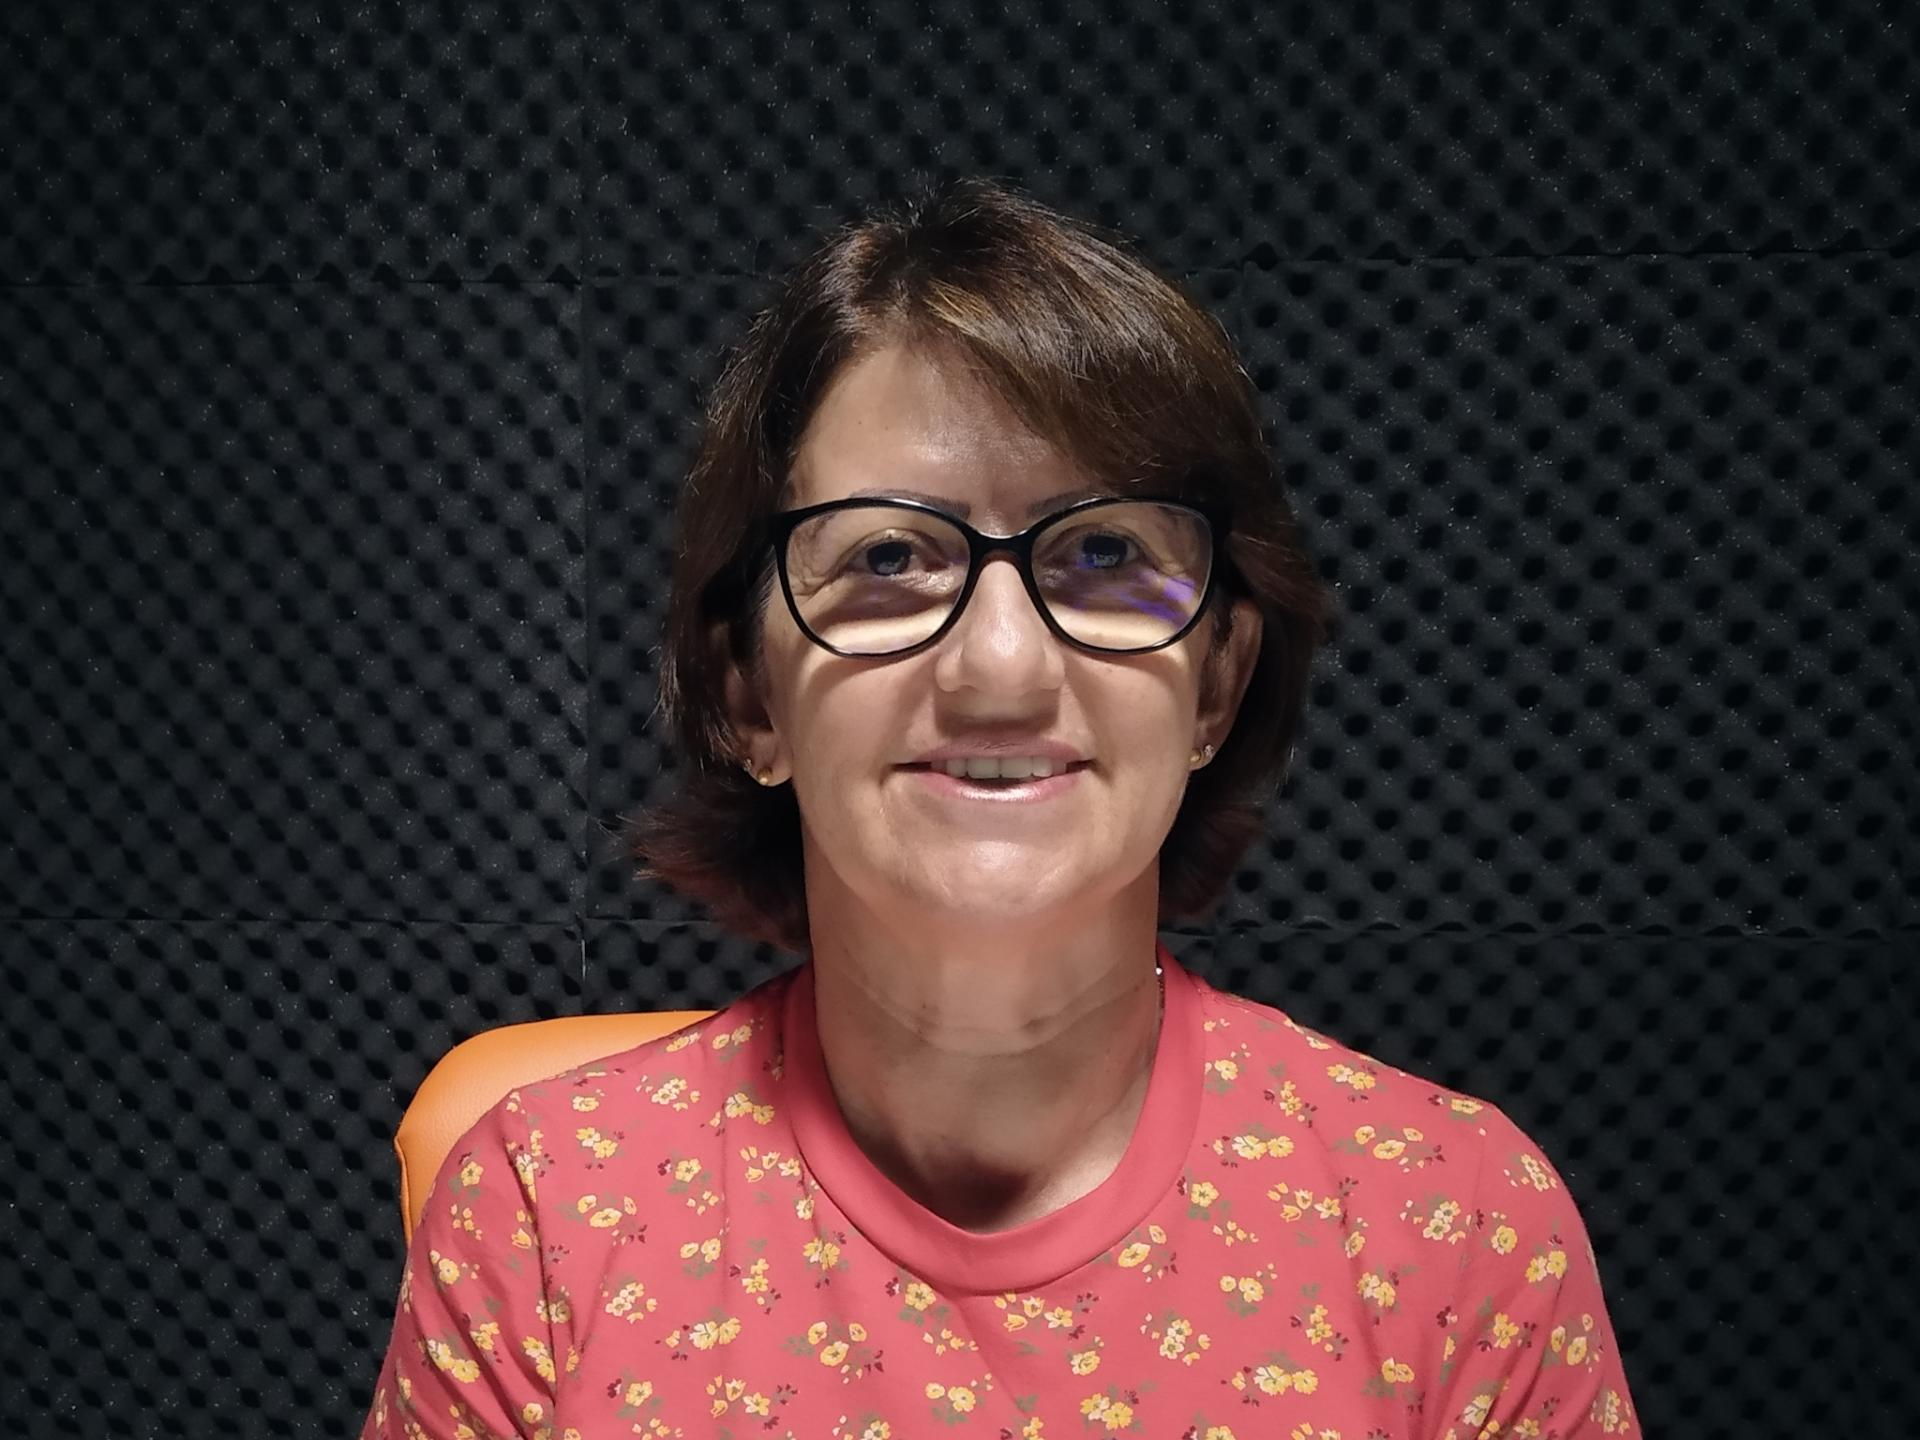 Entrevista com a Diretora do CEMEI Professora Eserci Balestrin Kanieski: Salete Gorgen